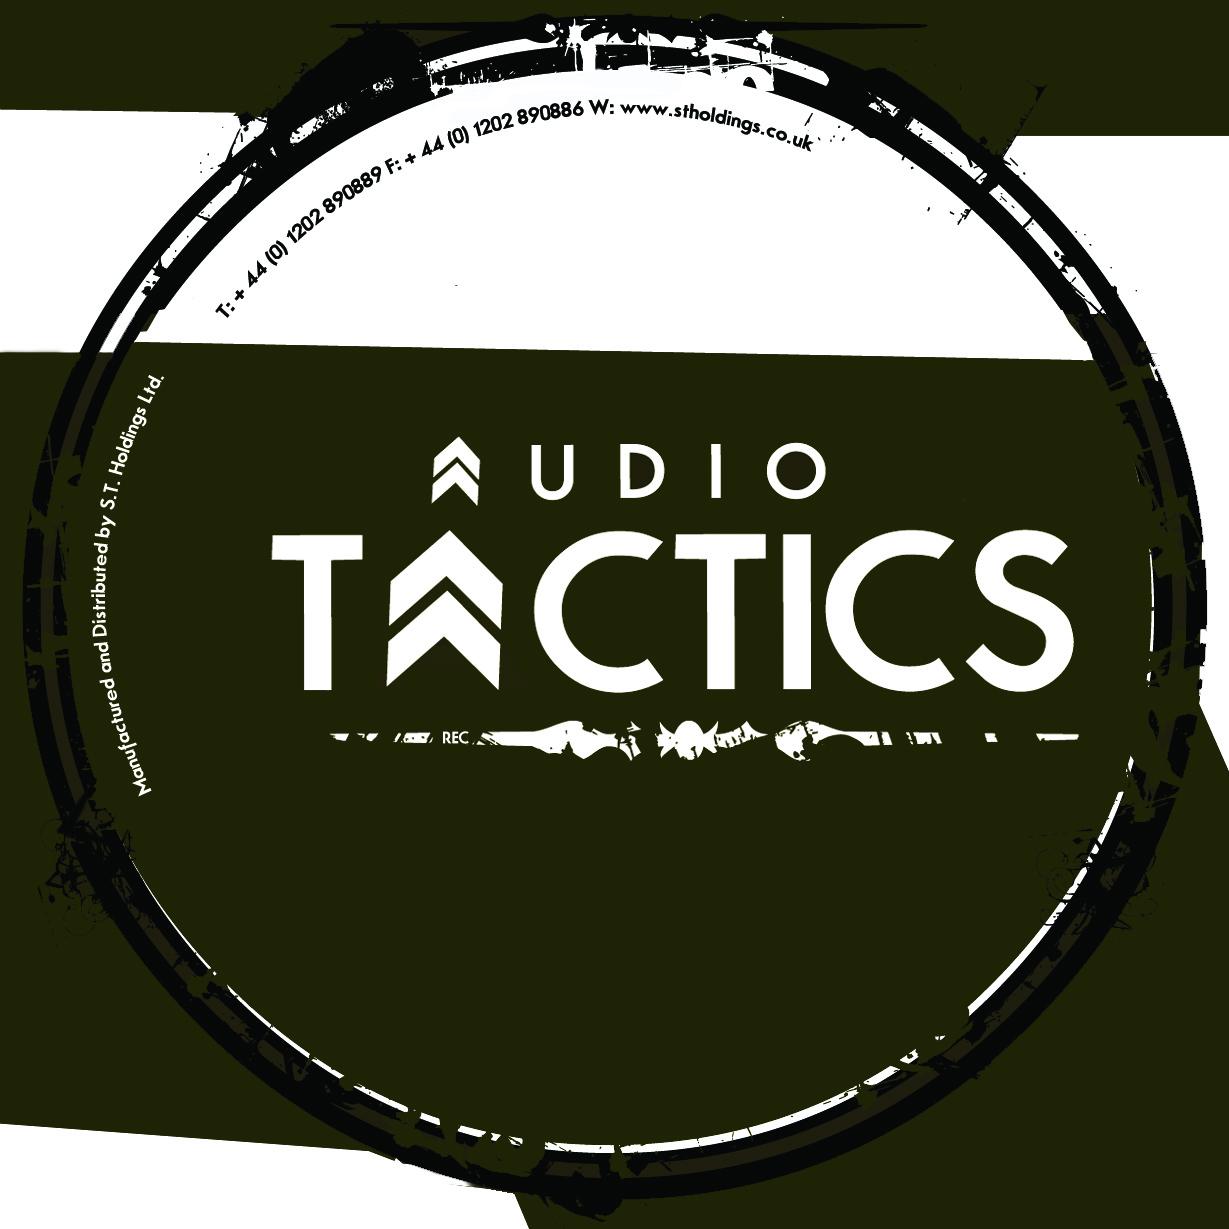 Audio Tactics